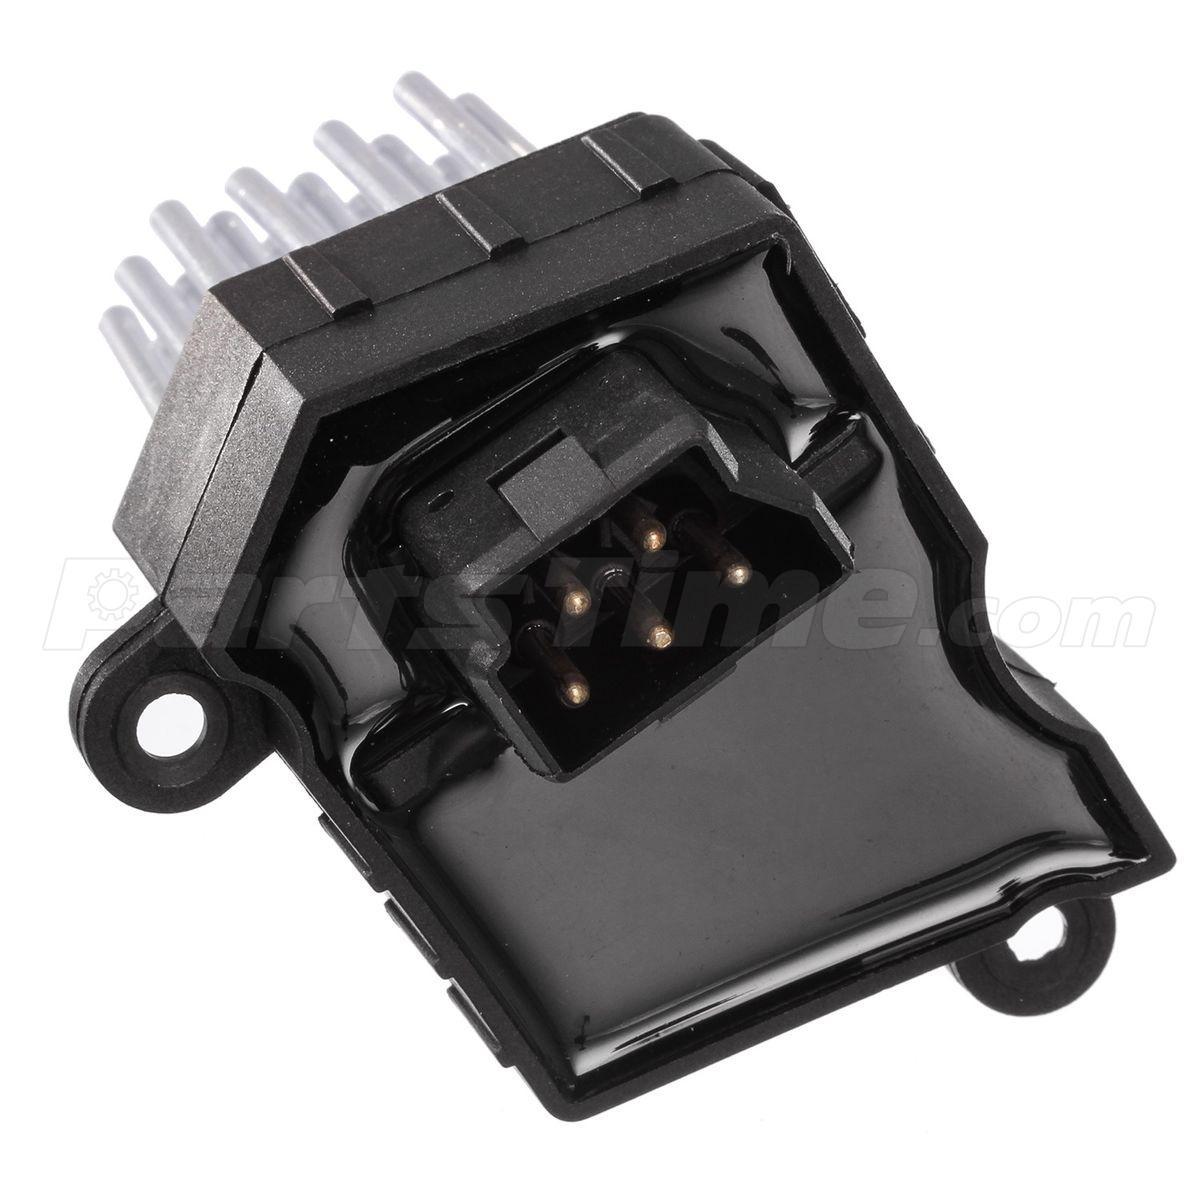 Heater Blower Motor Resistor For E46 E39 X3 E53 X5 M5